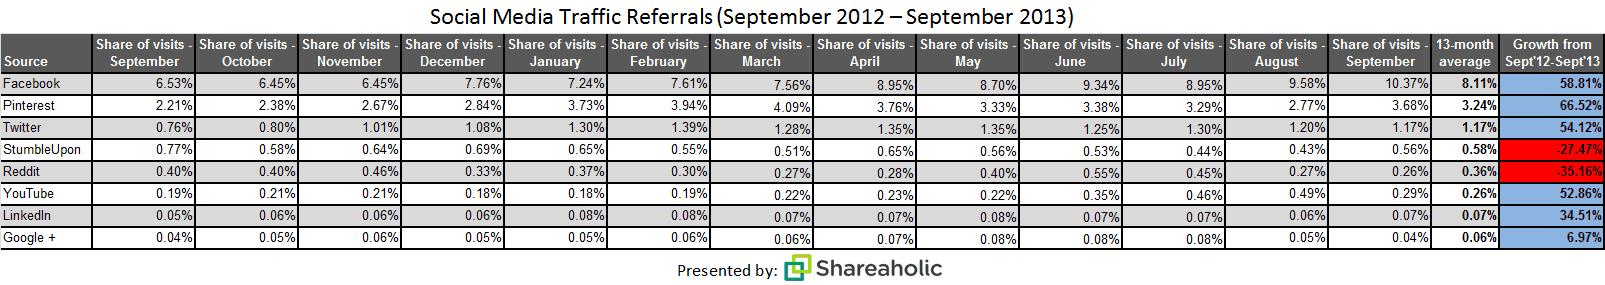 social media report Oct '13 stats